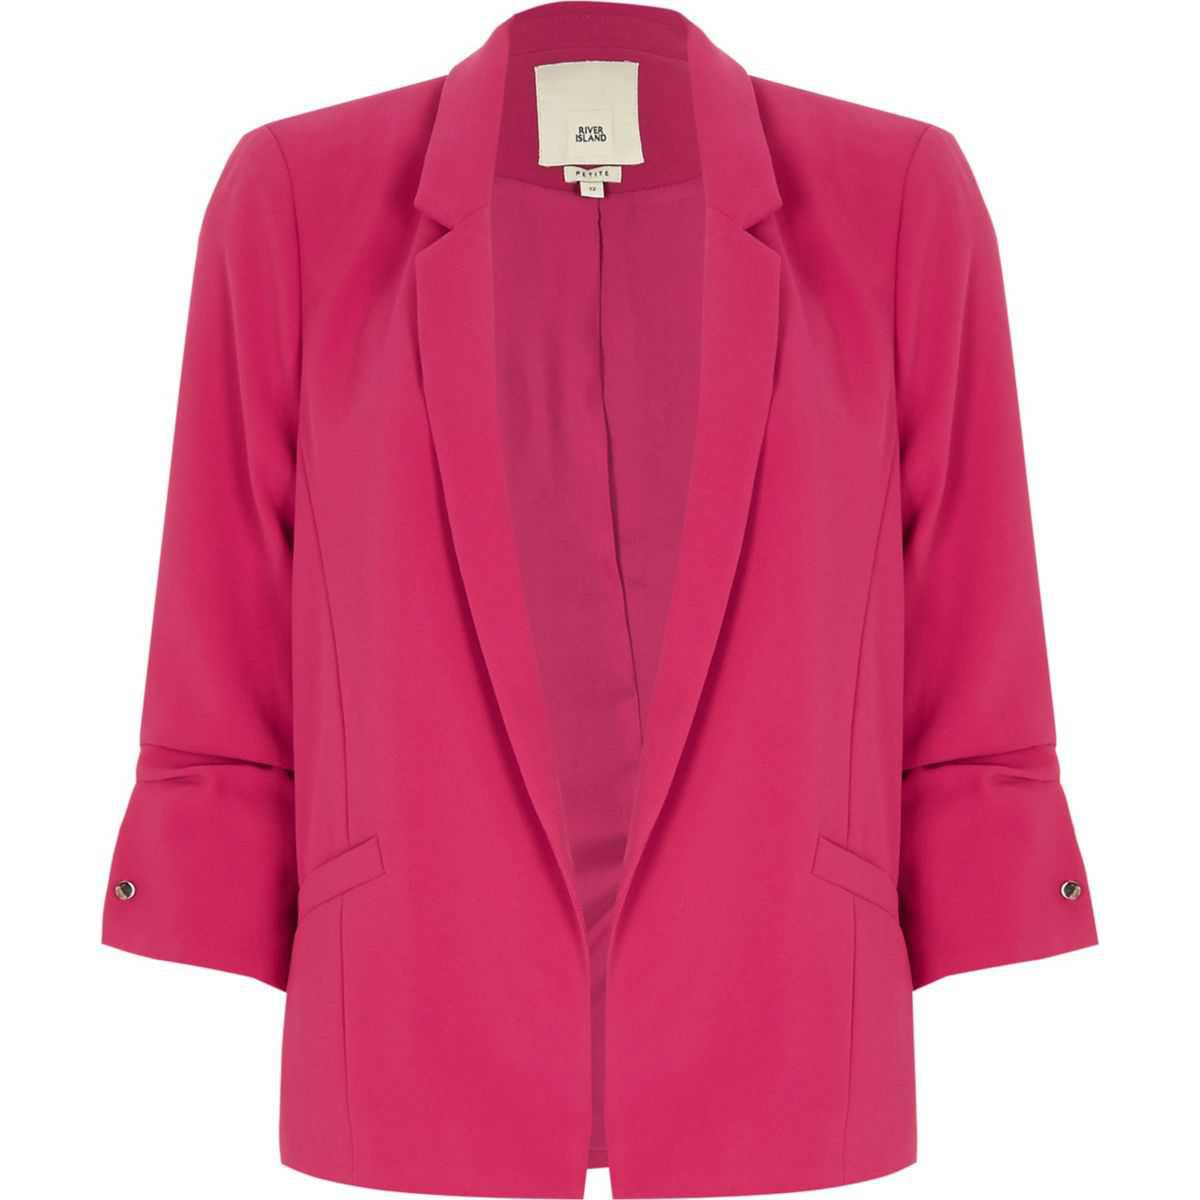 Petite bright pink bar cuff blazer - Coats & Jackets - Sale - women